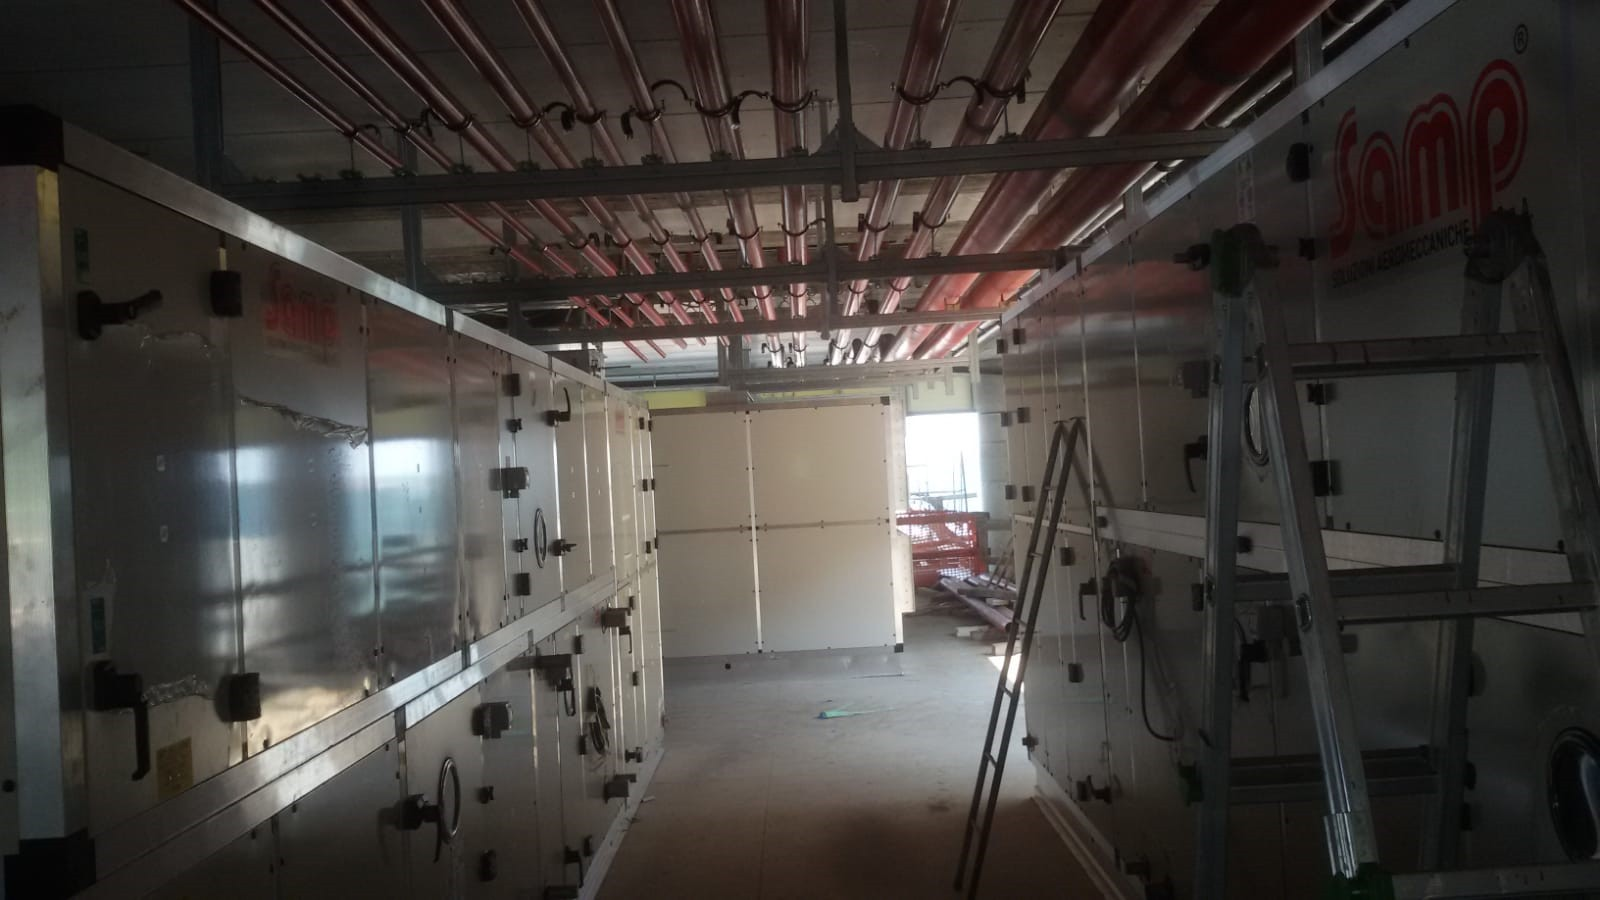 Work done for the new Alba-Bra hospital in Verduno